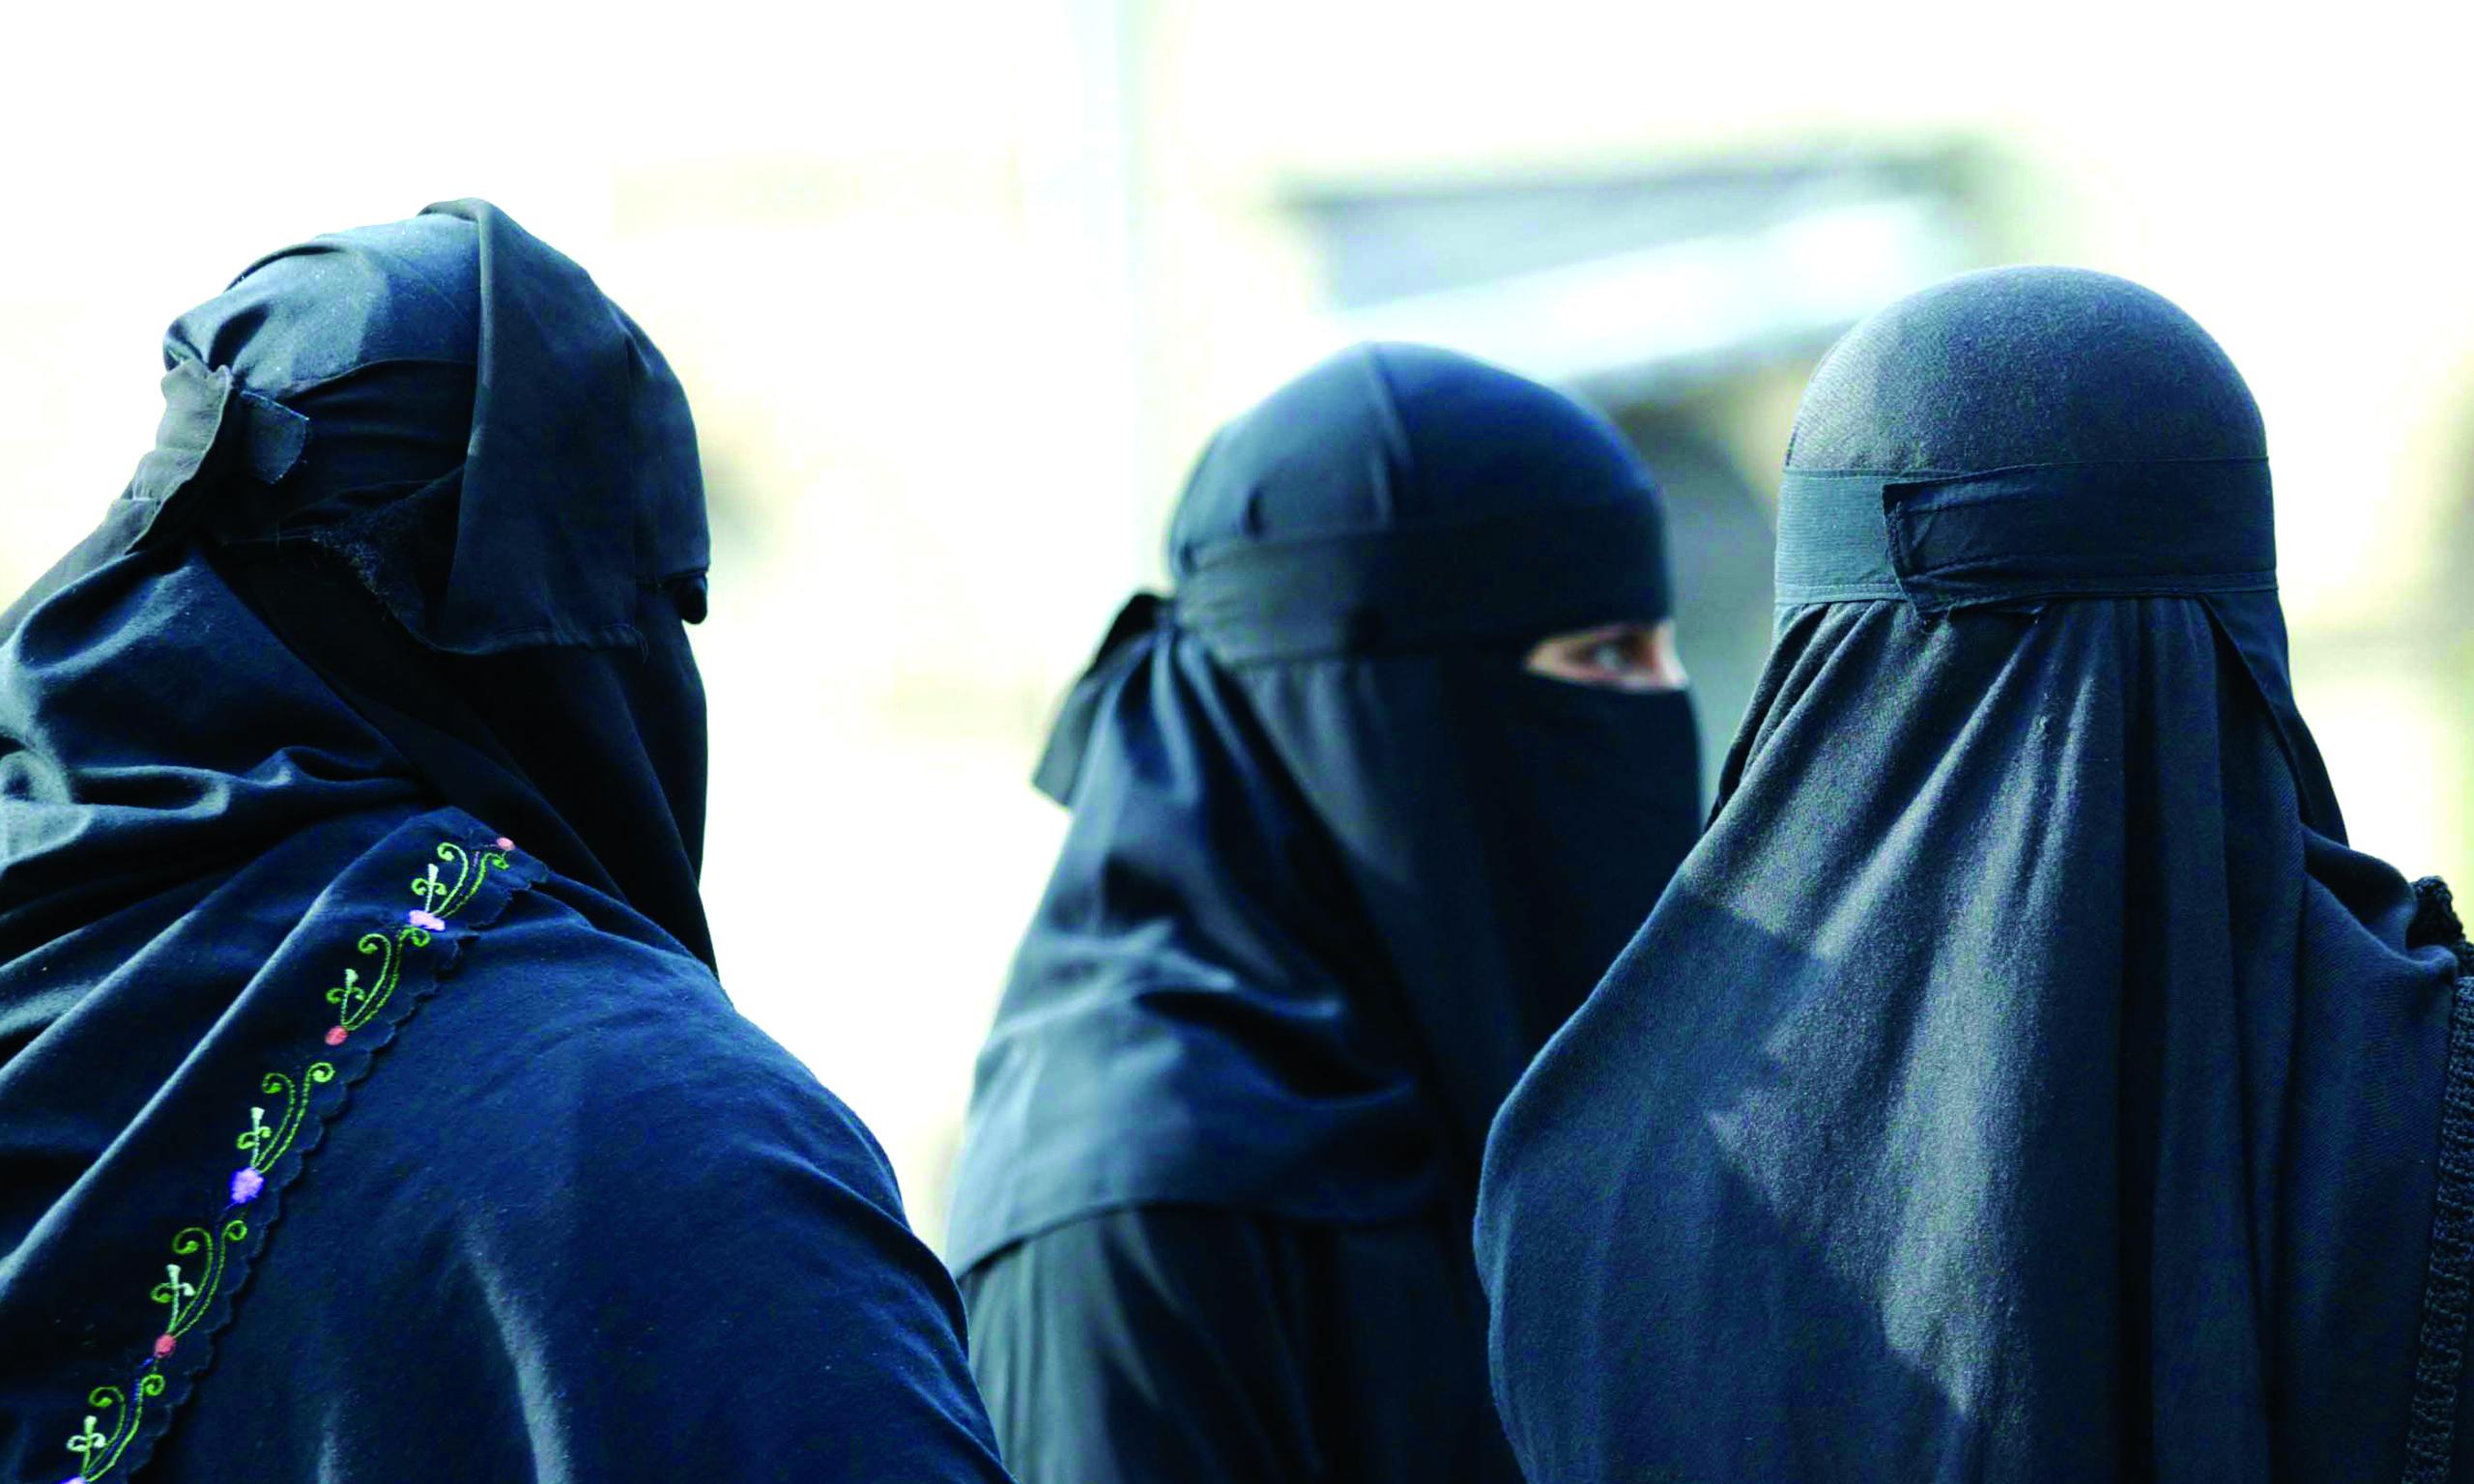 Fraudsters, Charlatans and Hidden Jihadis Masquerading as Liberal Muslims